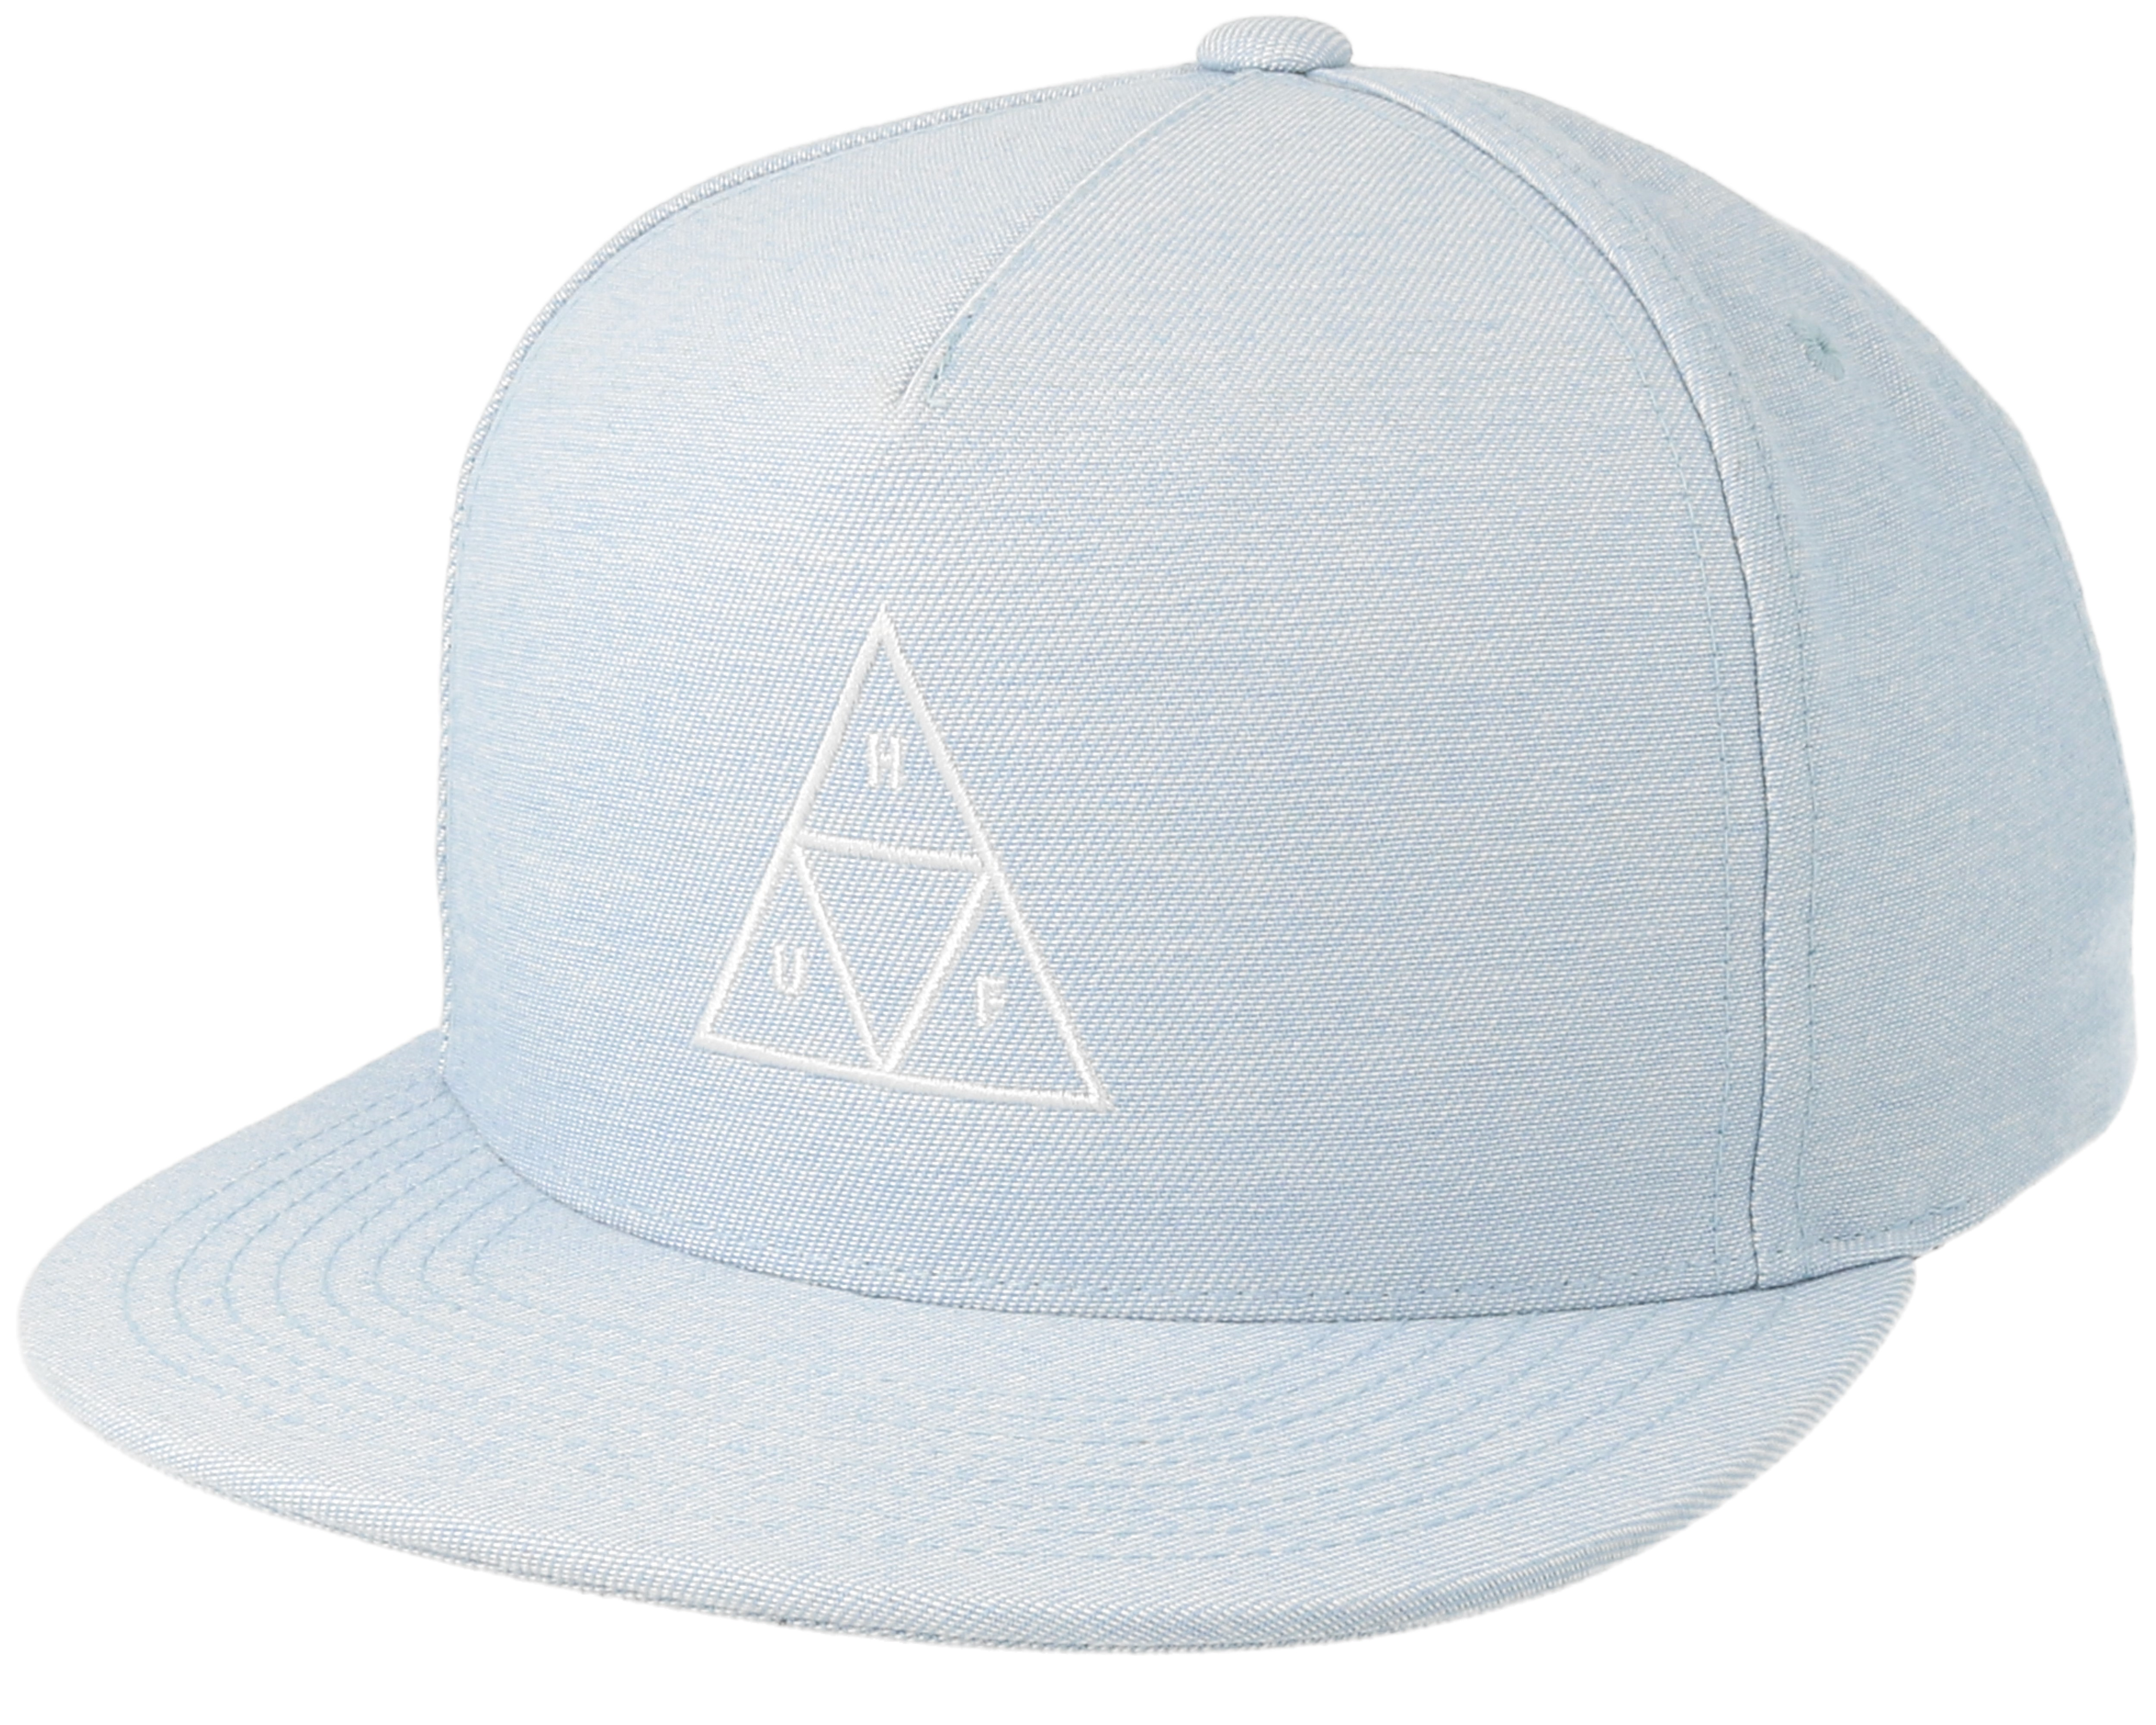 ... h strapback cap black gold 6cdbe 4a9d7 purchase triple triangle blue  snapback huf caps hatstore cc293 91f63 ... 4b090f1514a7